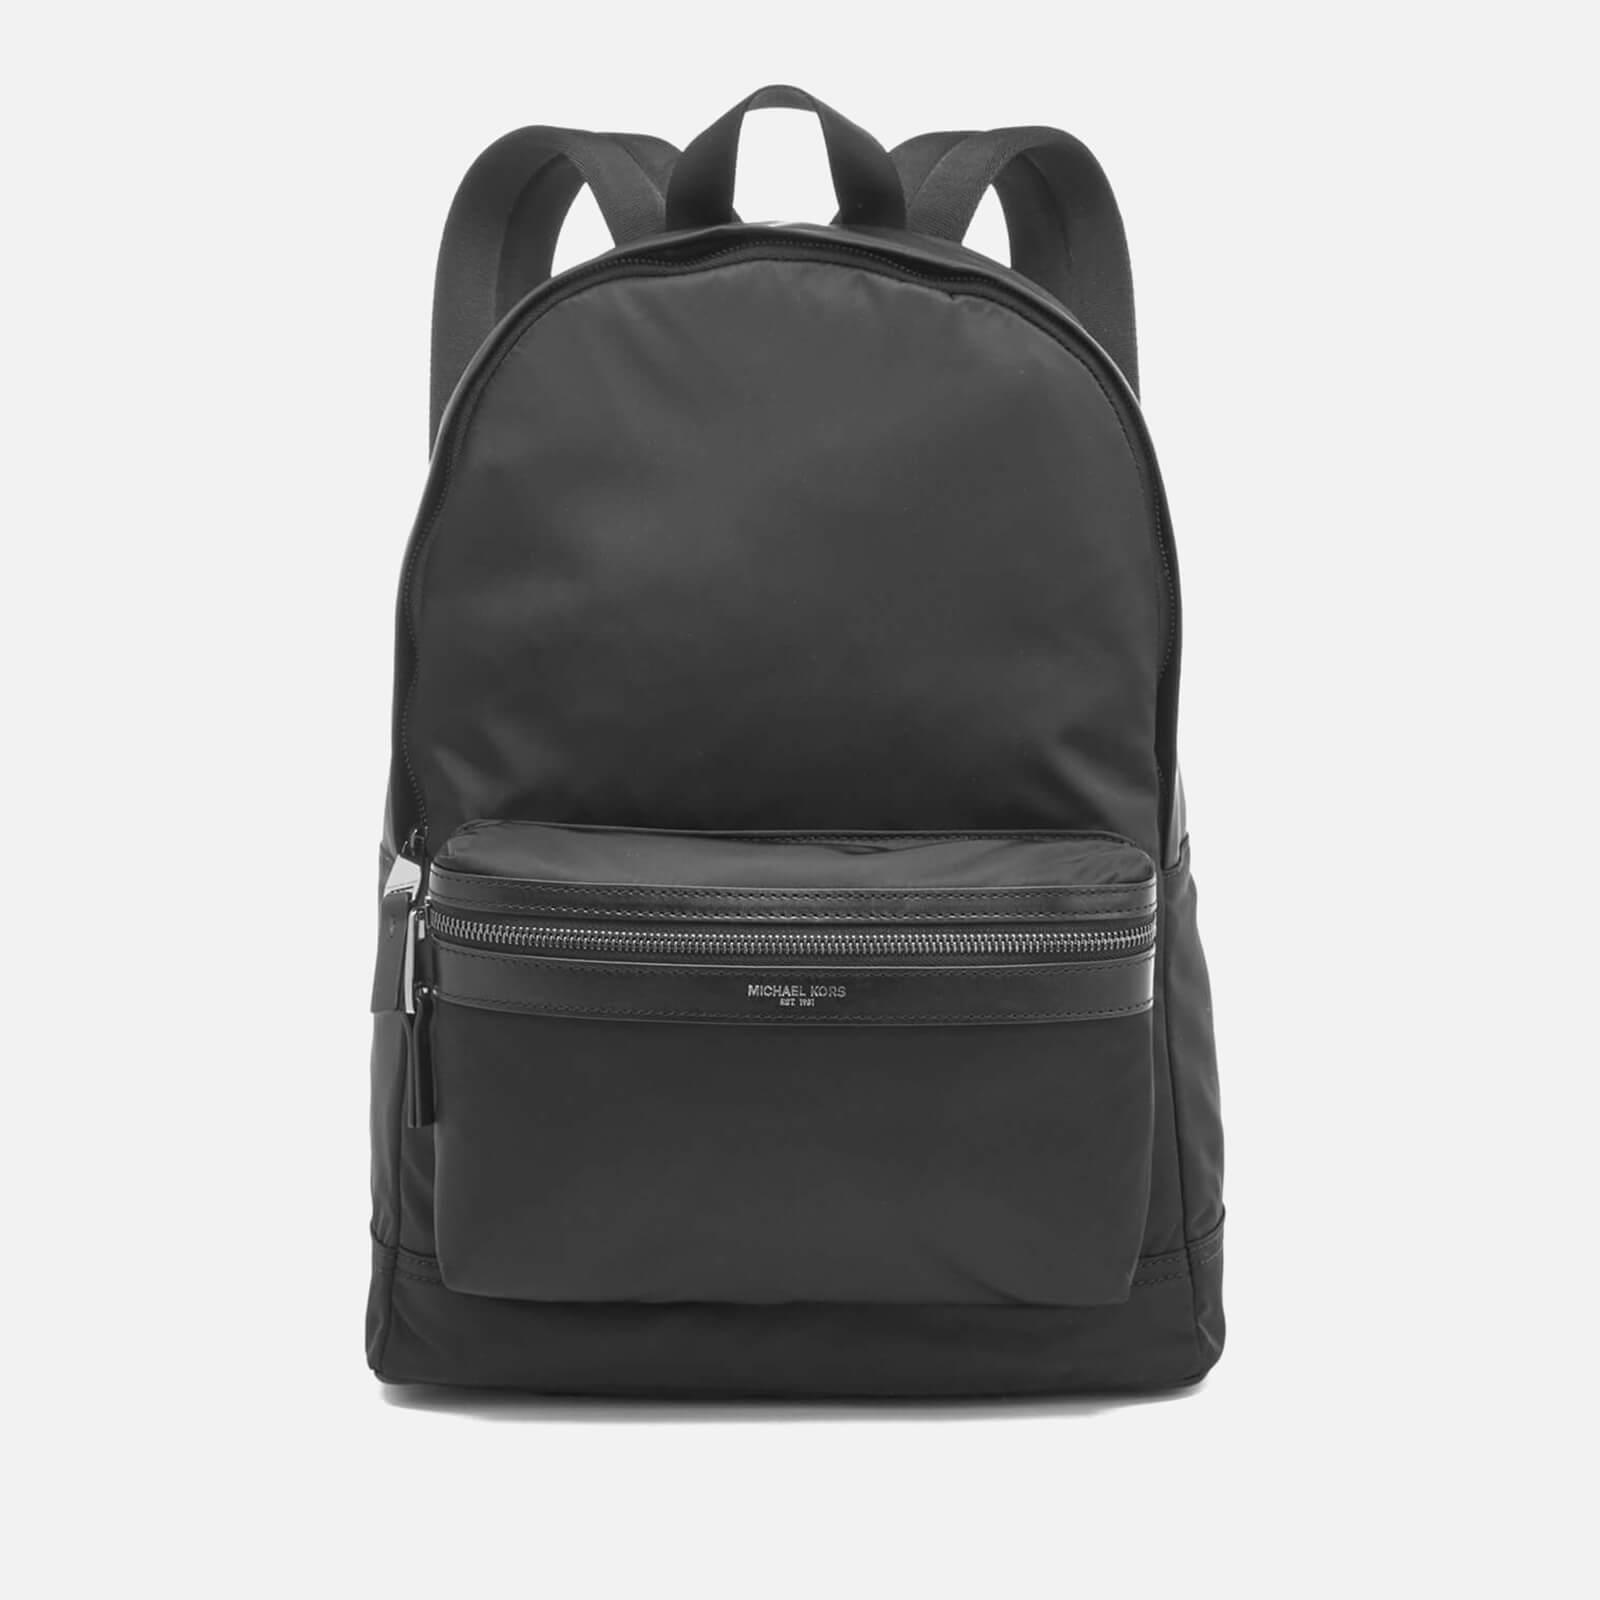 best service e6b8e 8be85 Michael Kors Men's Kent Backpack - Black